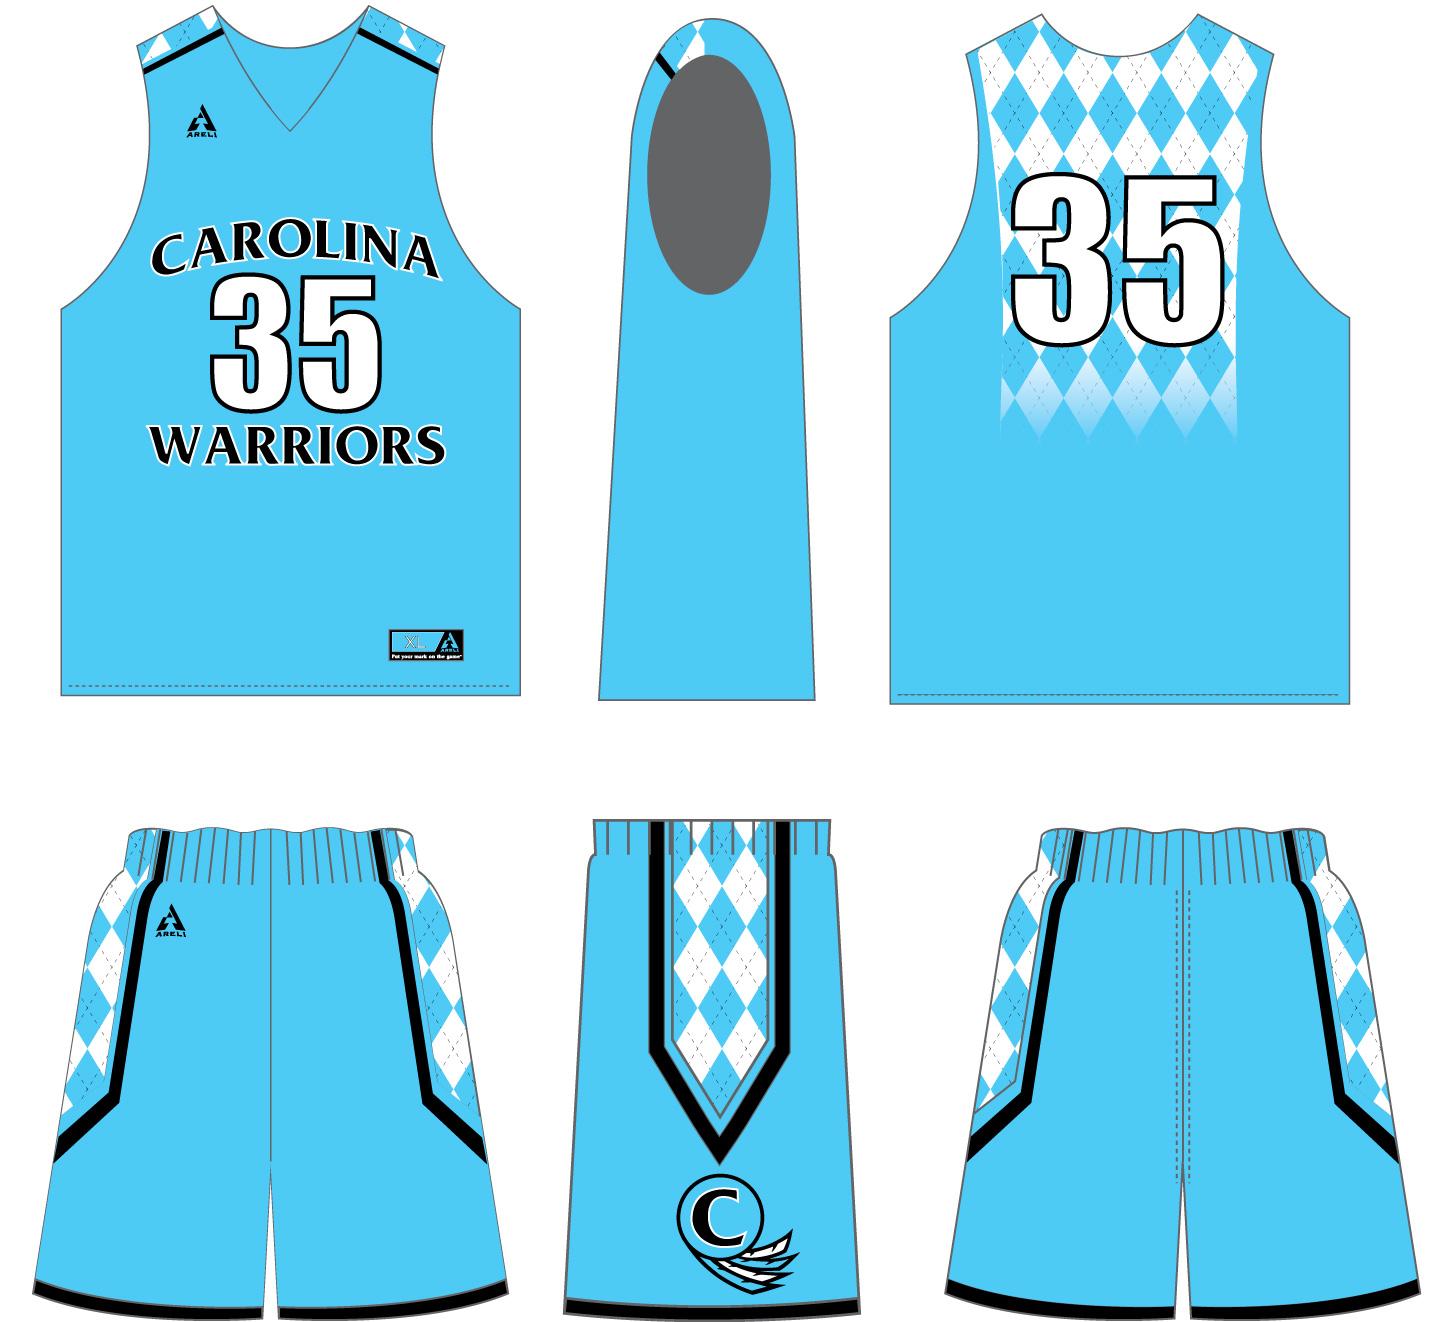 cc173330e Custom Sublimated Basketball Game Uniform — Areli Sportswear